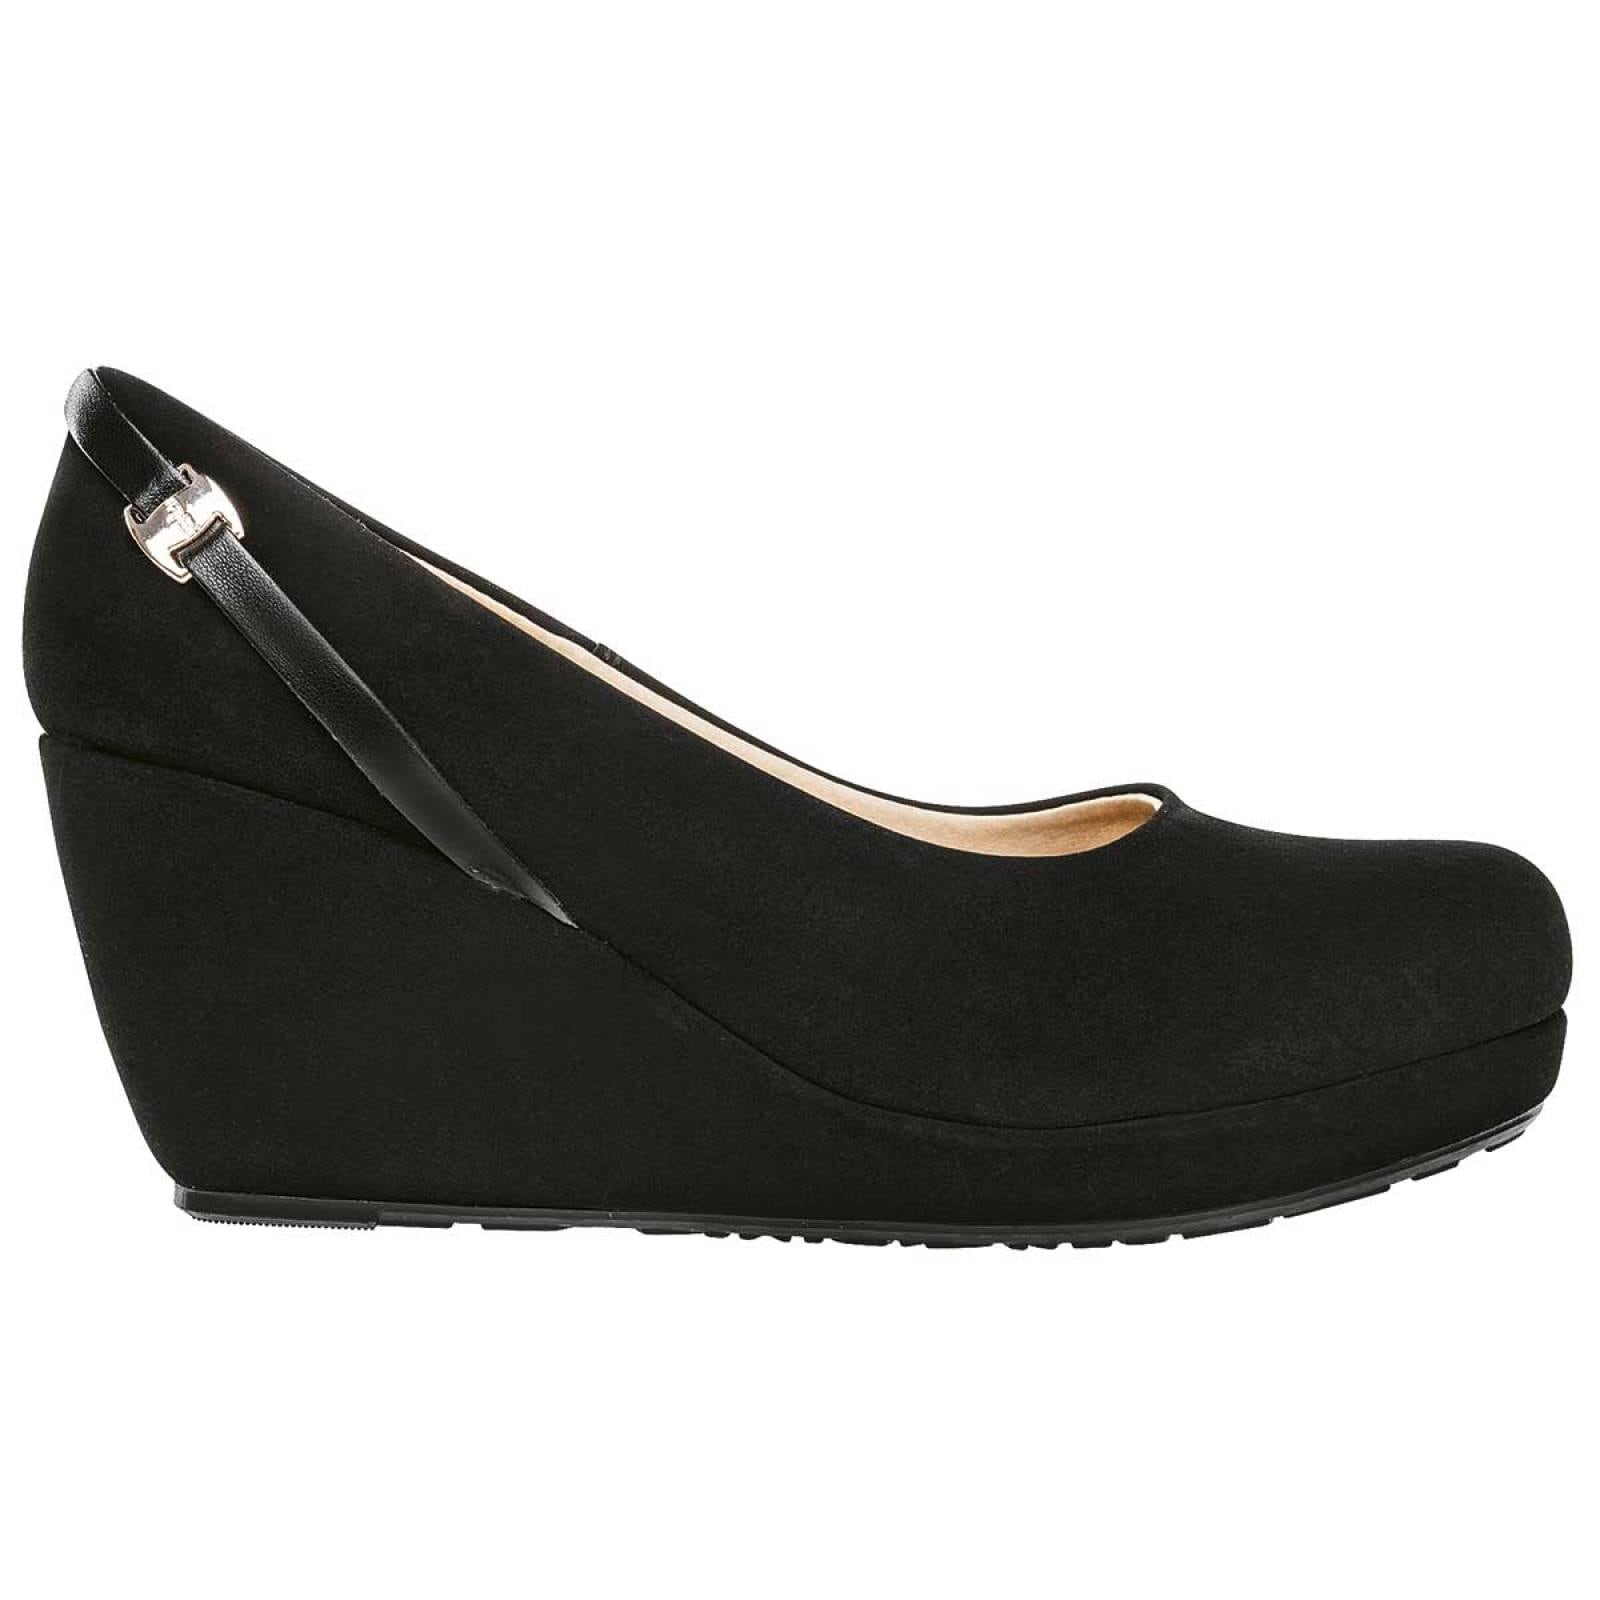 Lital liyu Zapato Mujer Negro